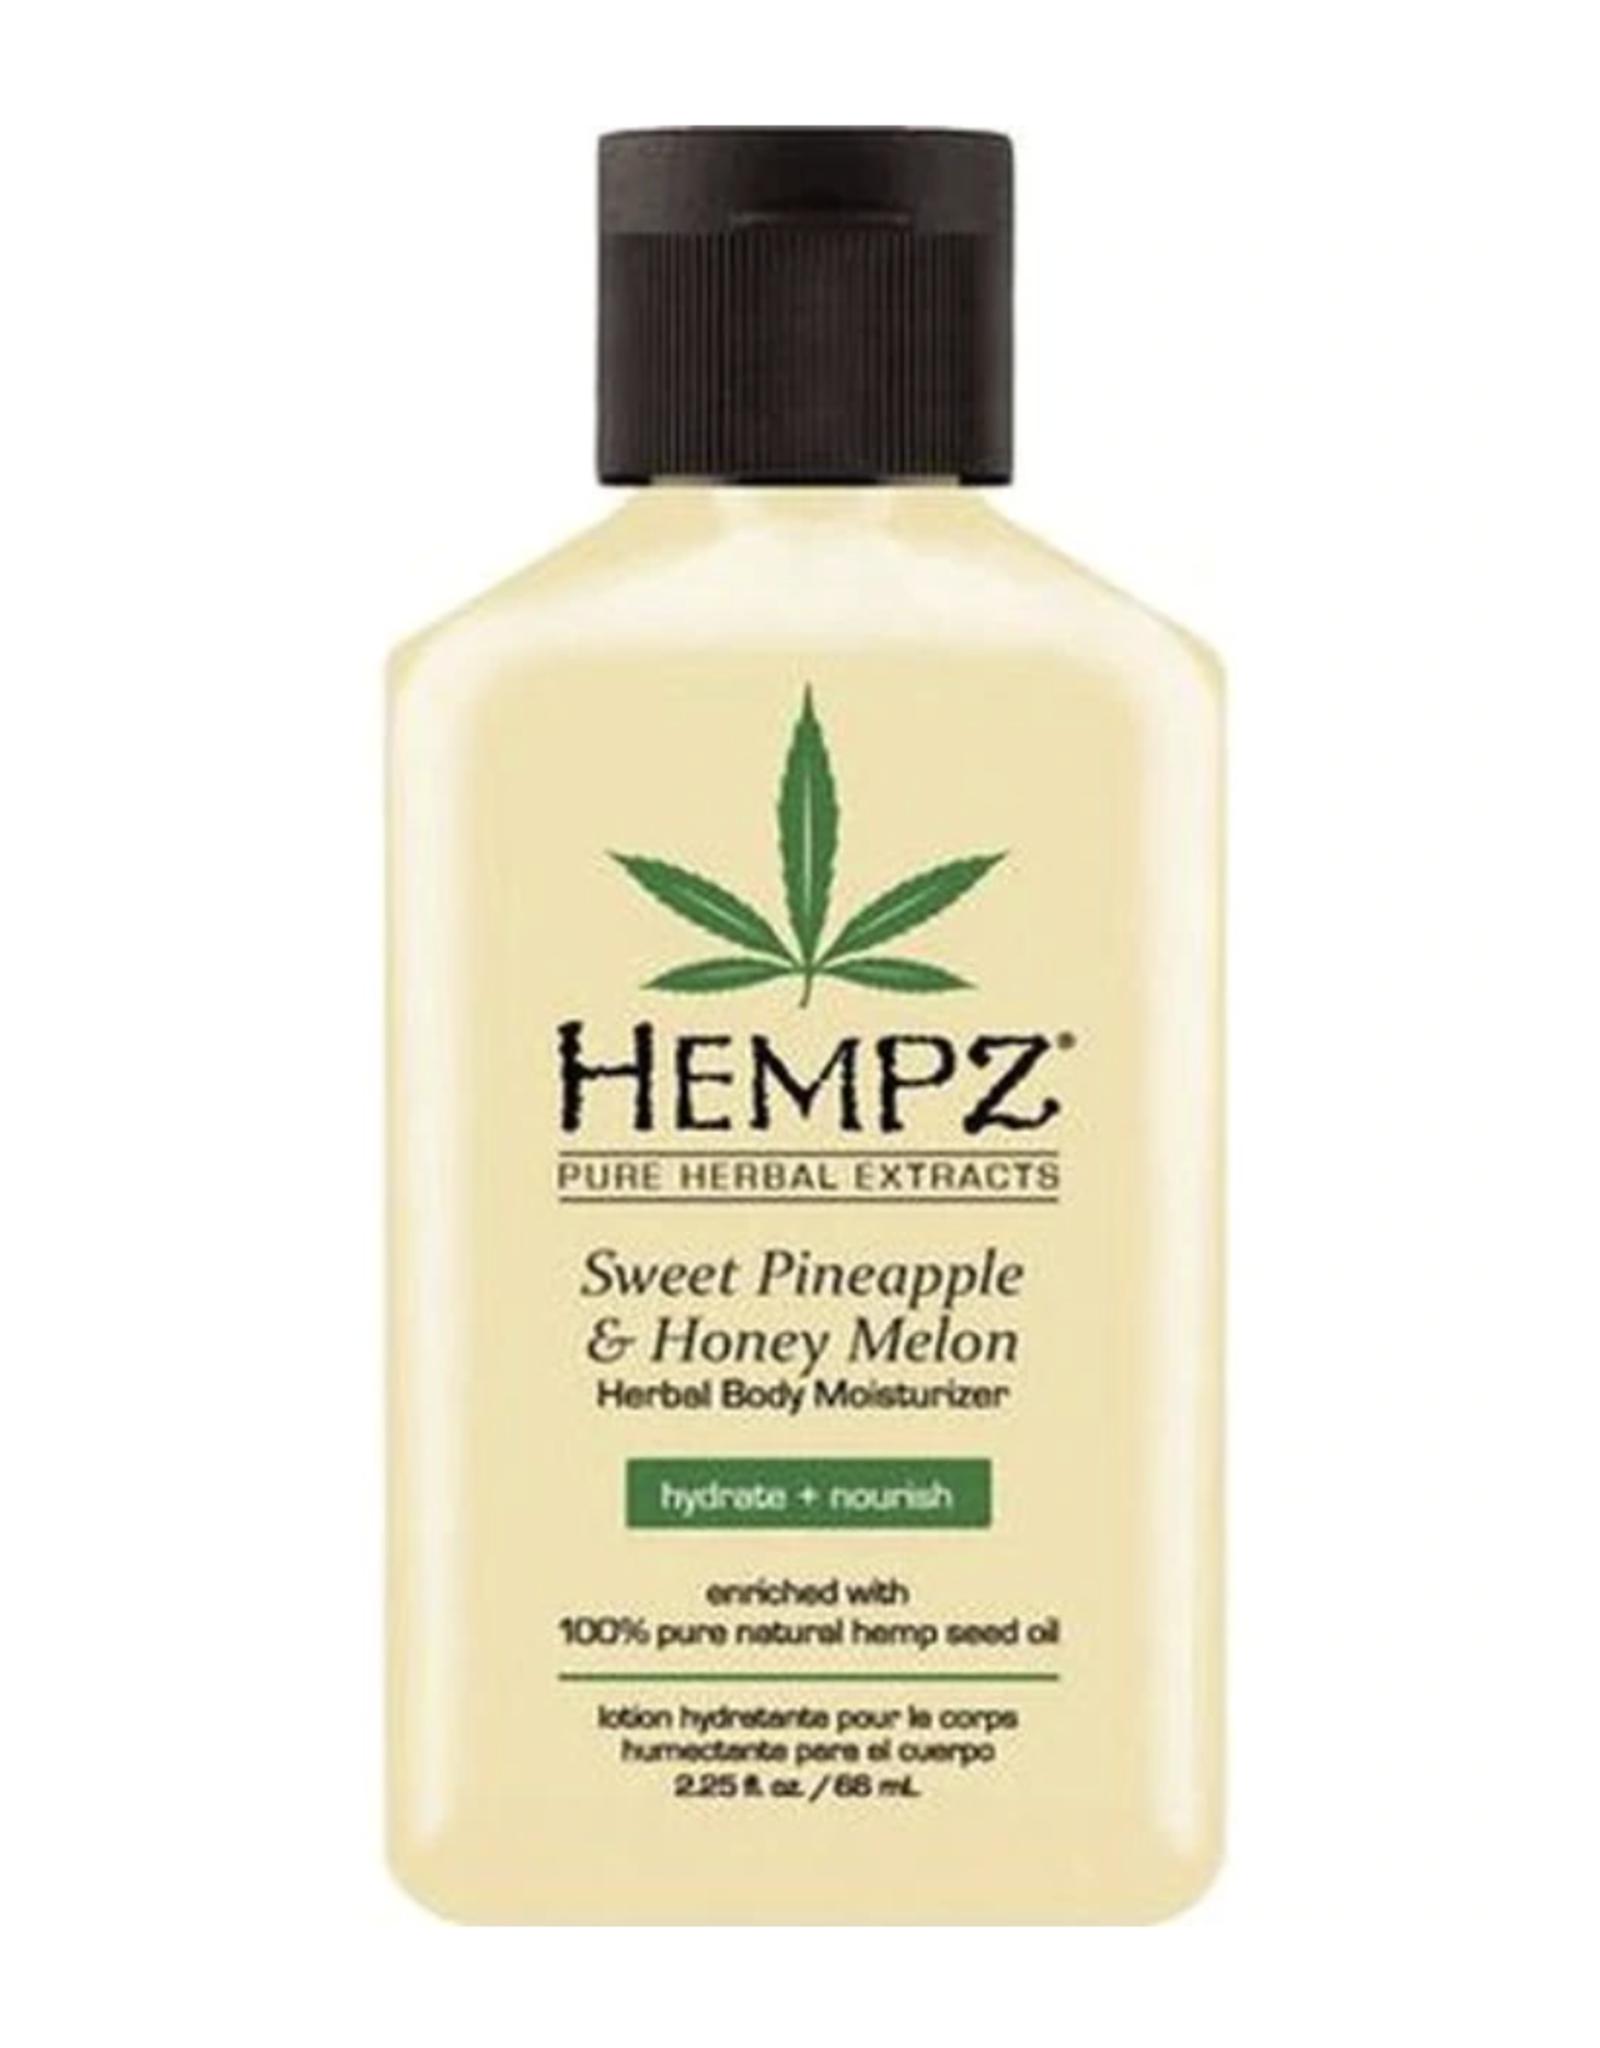 Hempz Hempz Sweet Pineapple & Honey Melon Moisturizer 2.25 oz